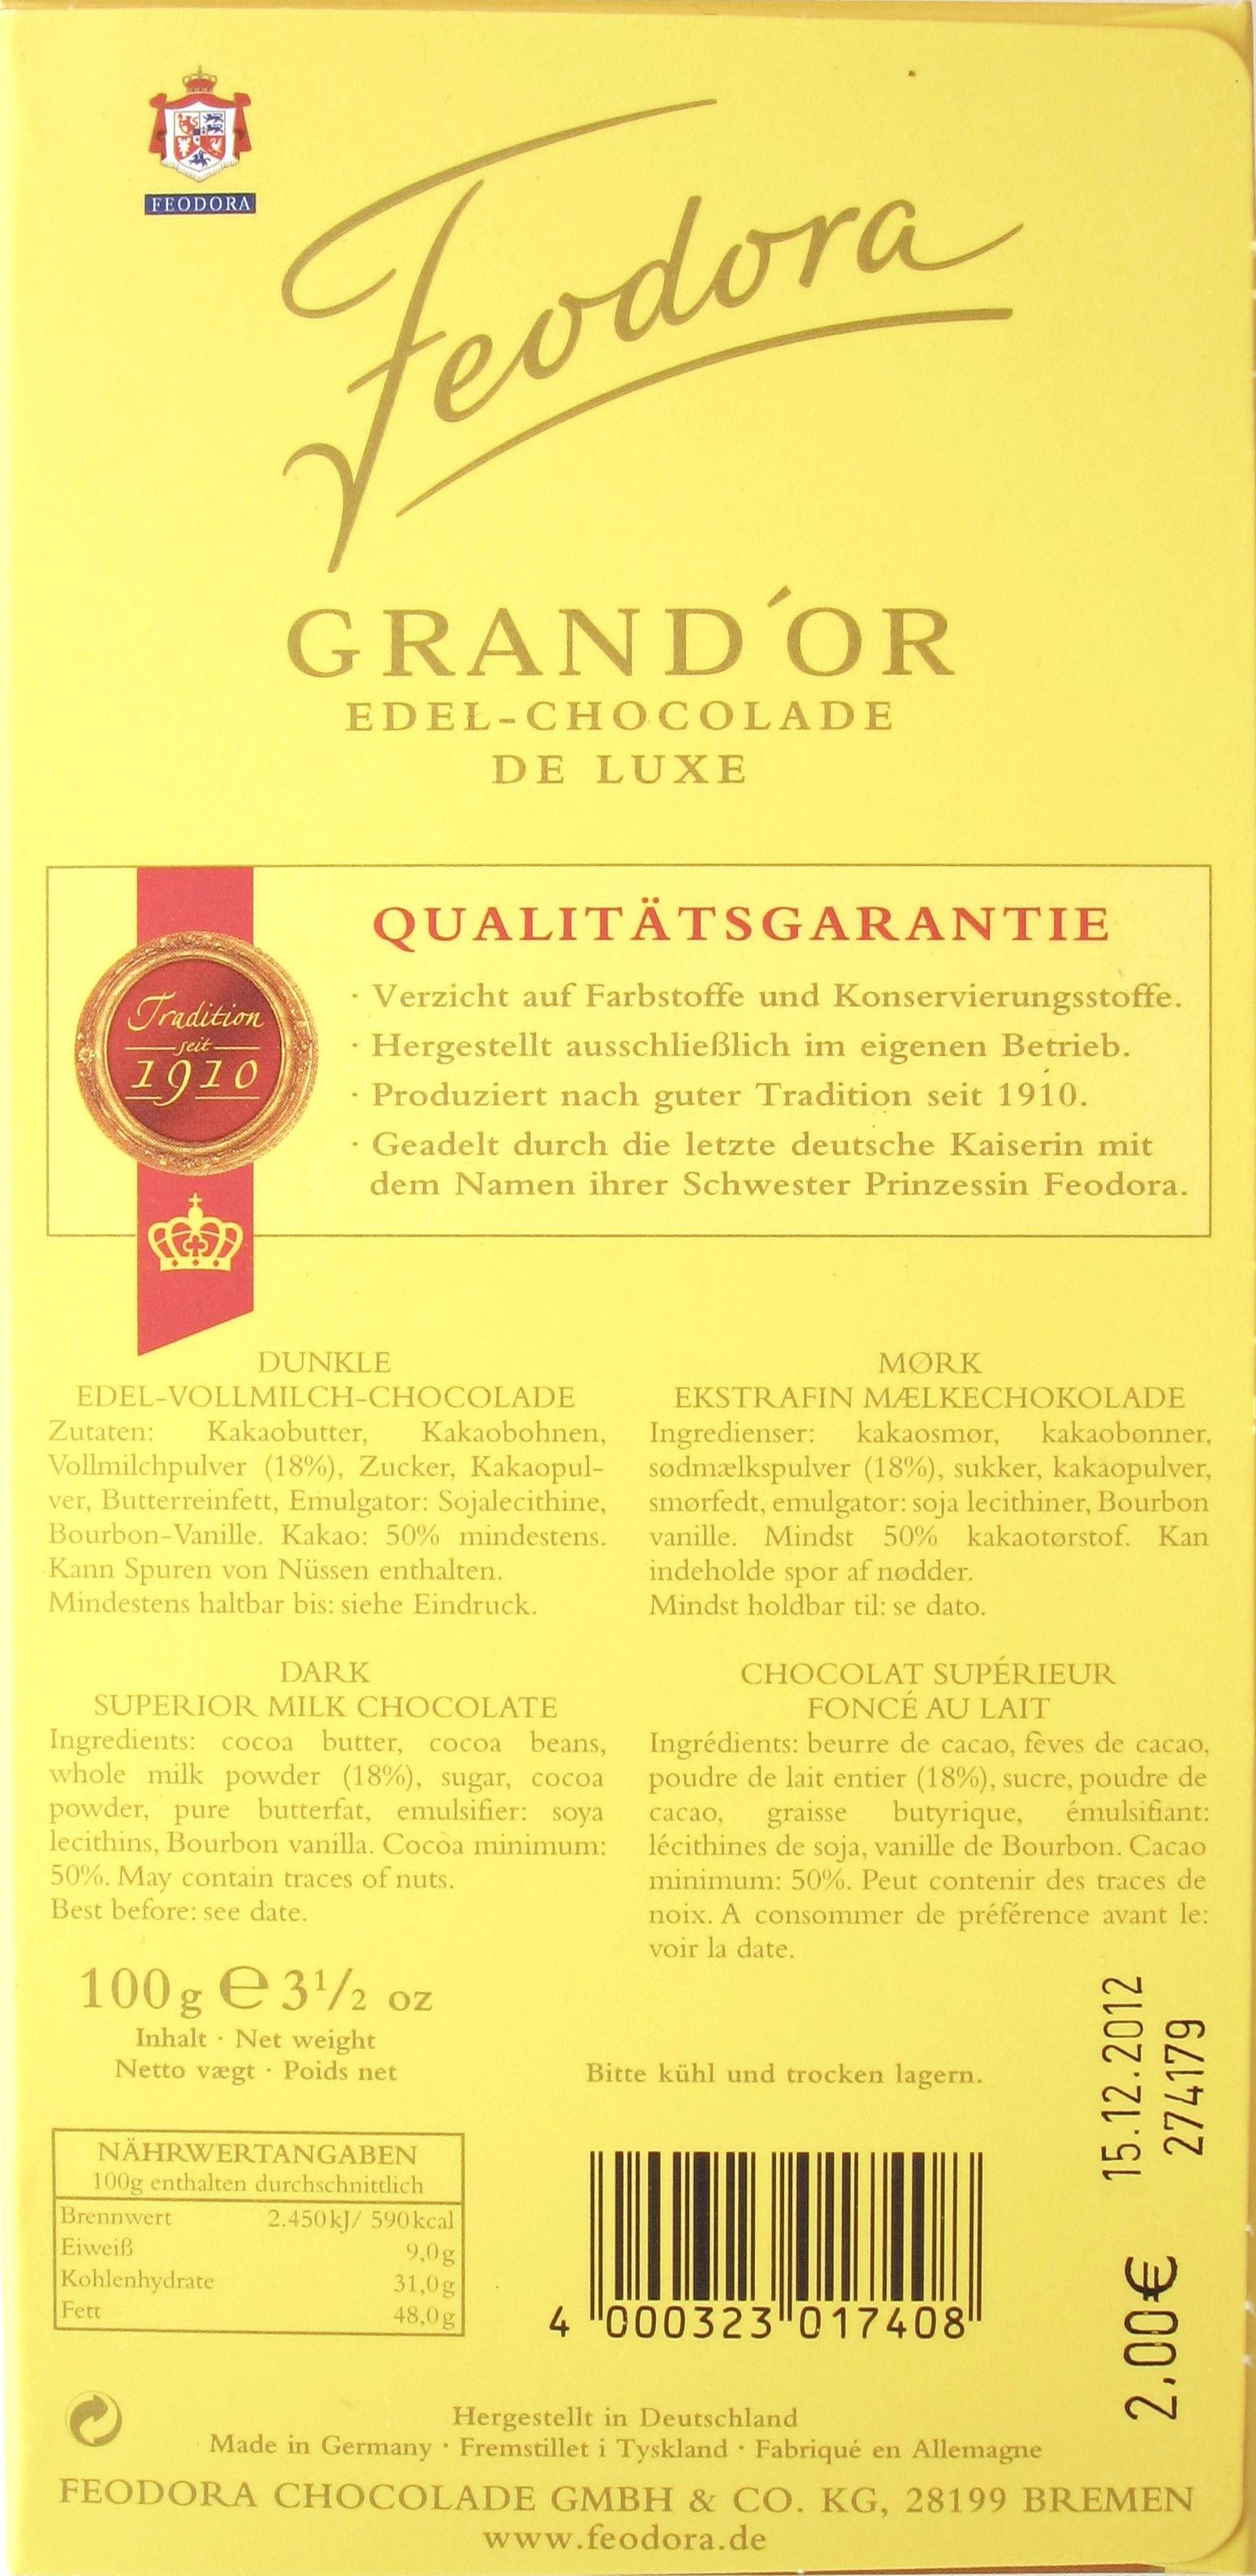 Feodora Dunkle Milchschokolade: Rückseite